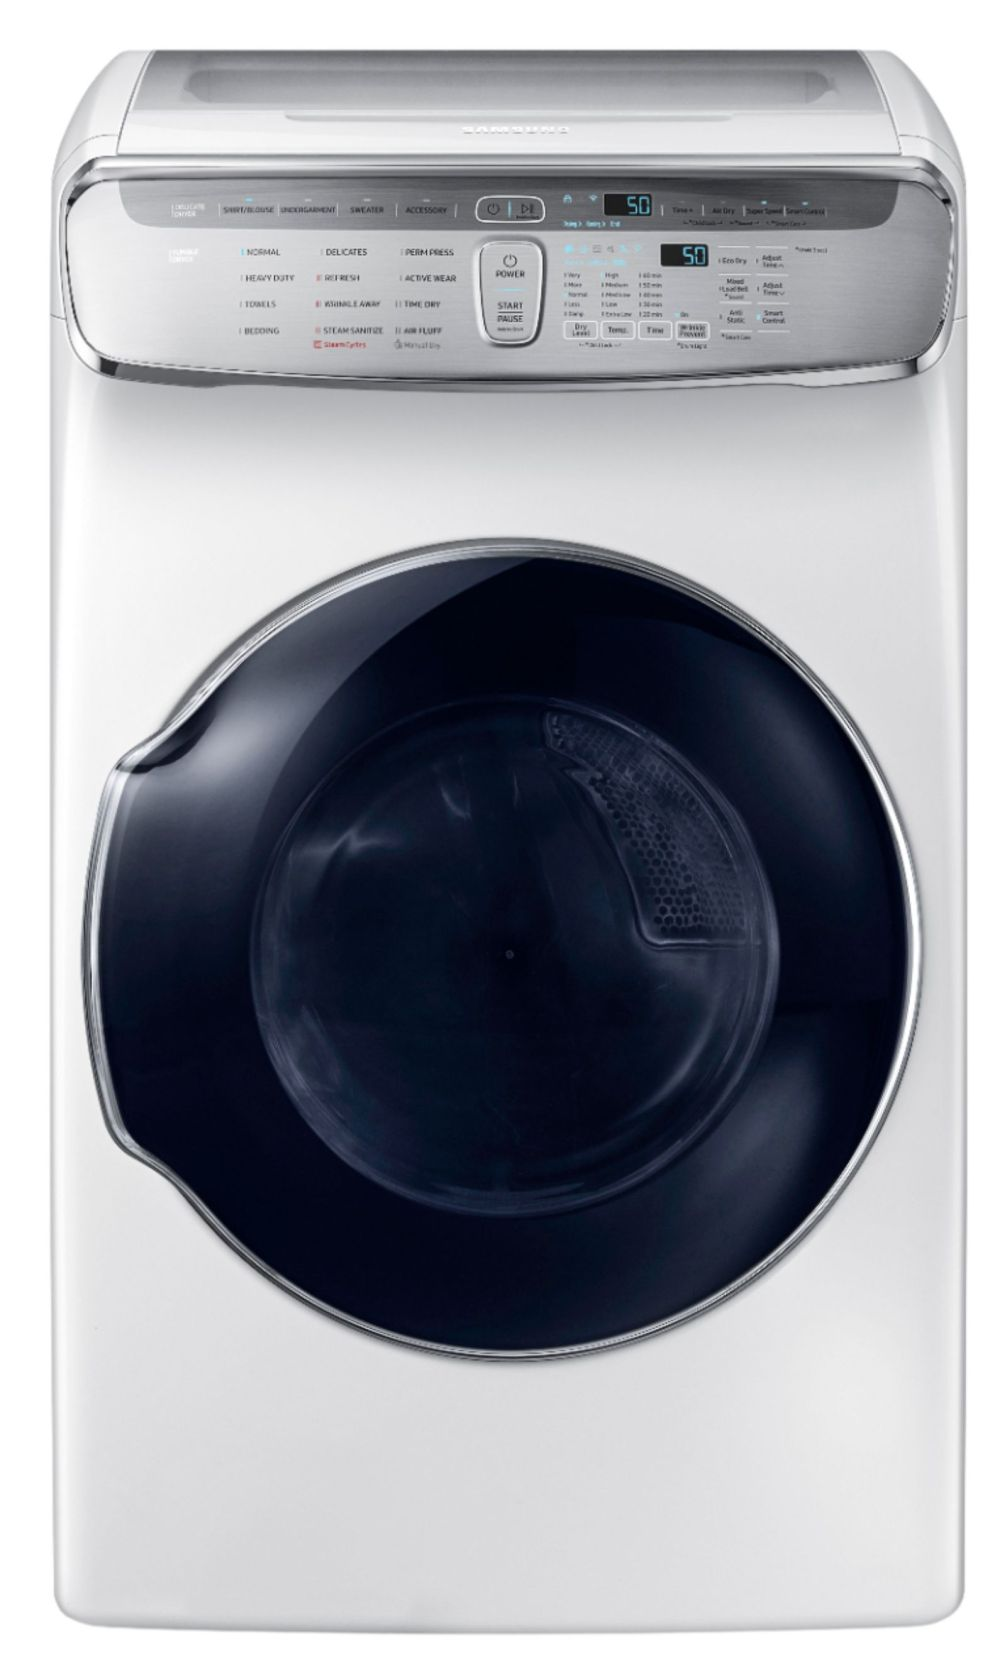 medium resolution of capacity flexdry electric dryer white dve60m9900w best buy